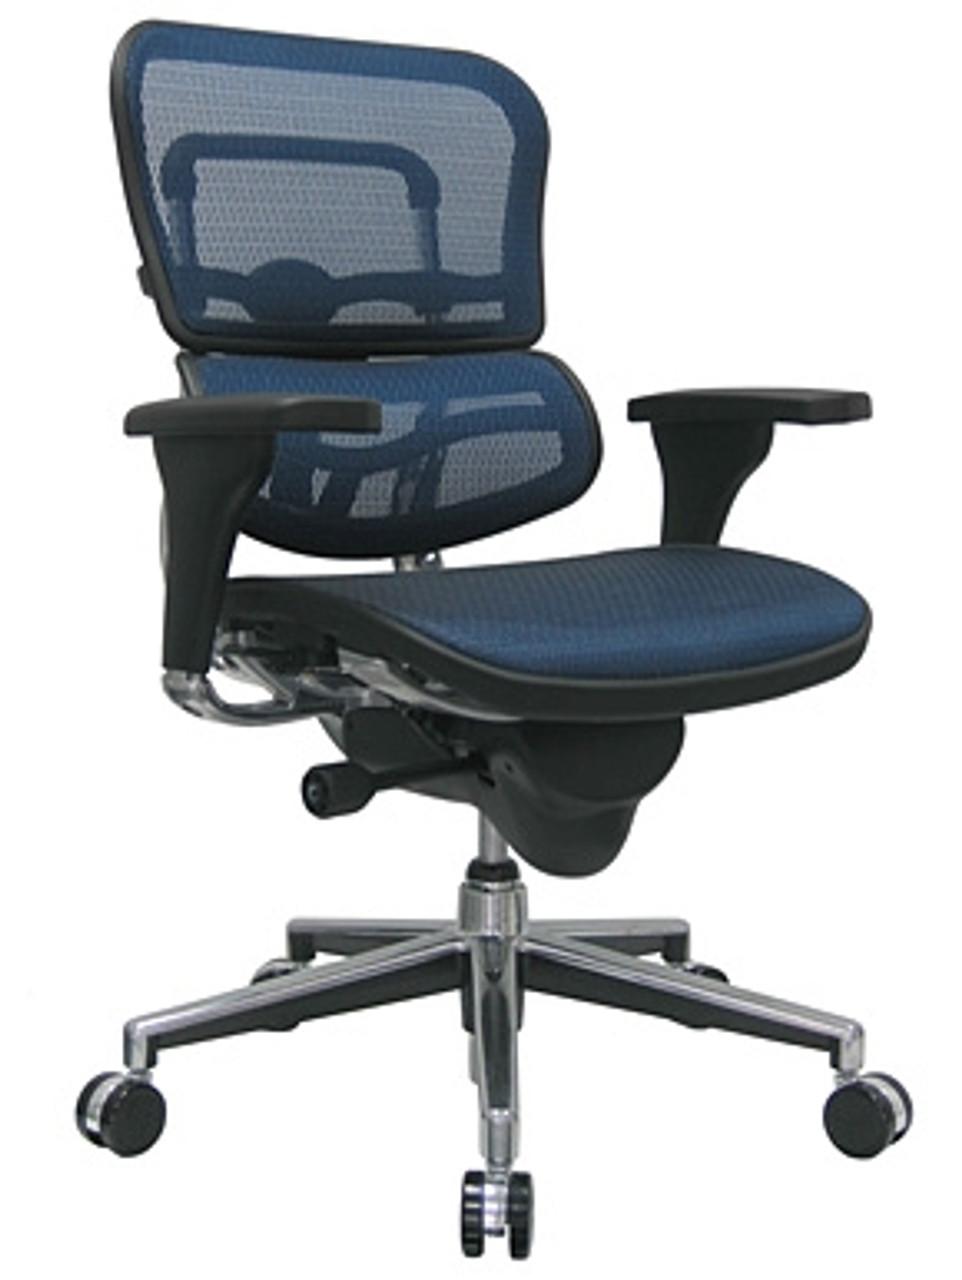 Eurotech Ergohuman Mesh Chair ME446ERGLO (46 Mesh Colors Available!)